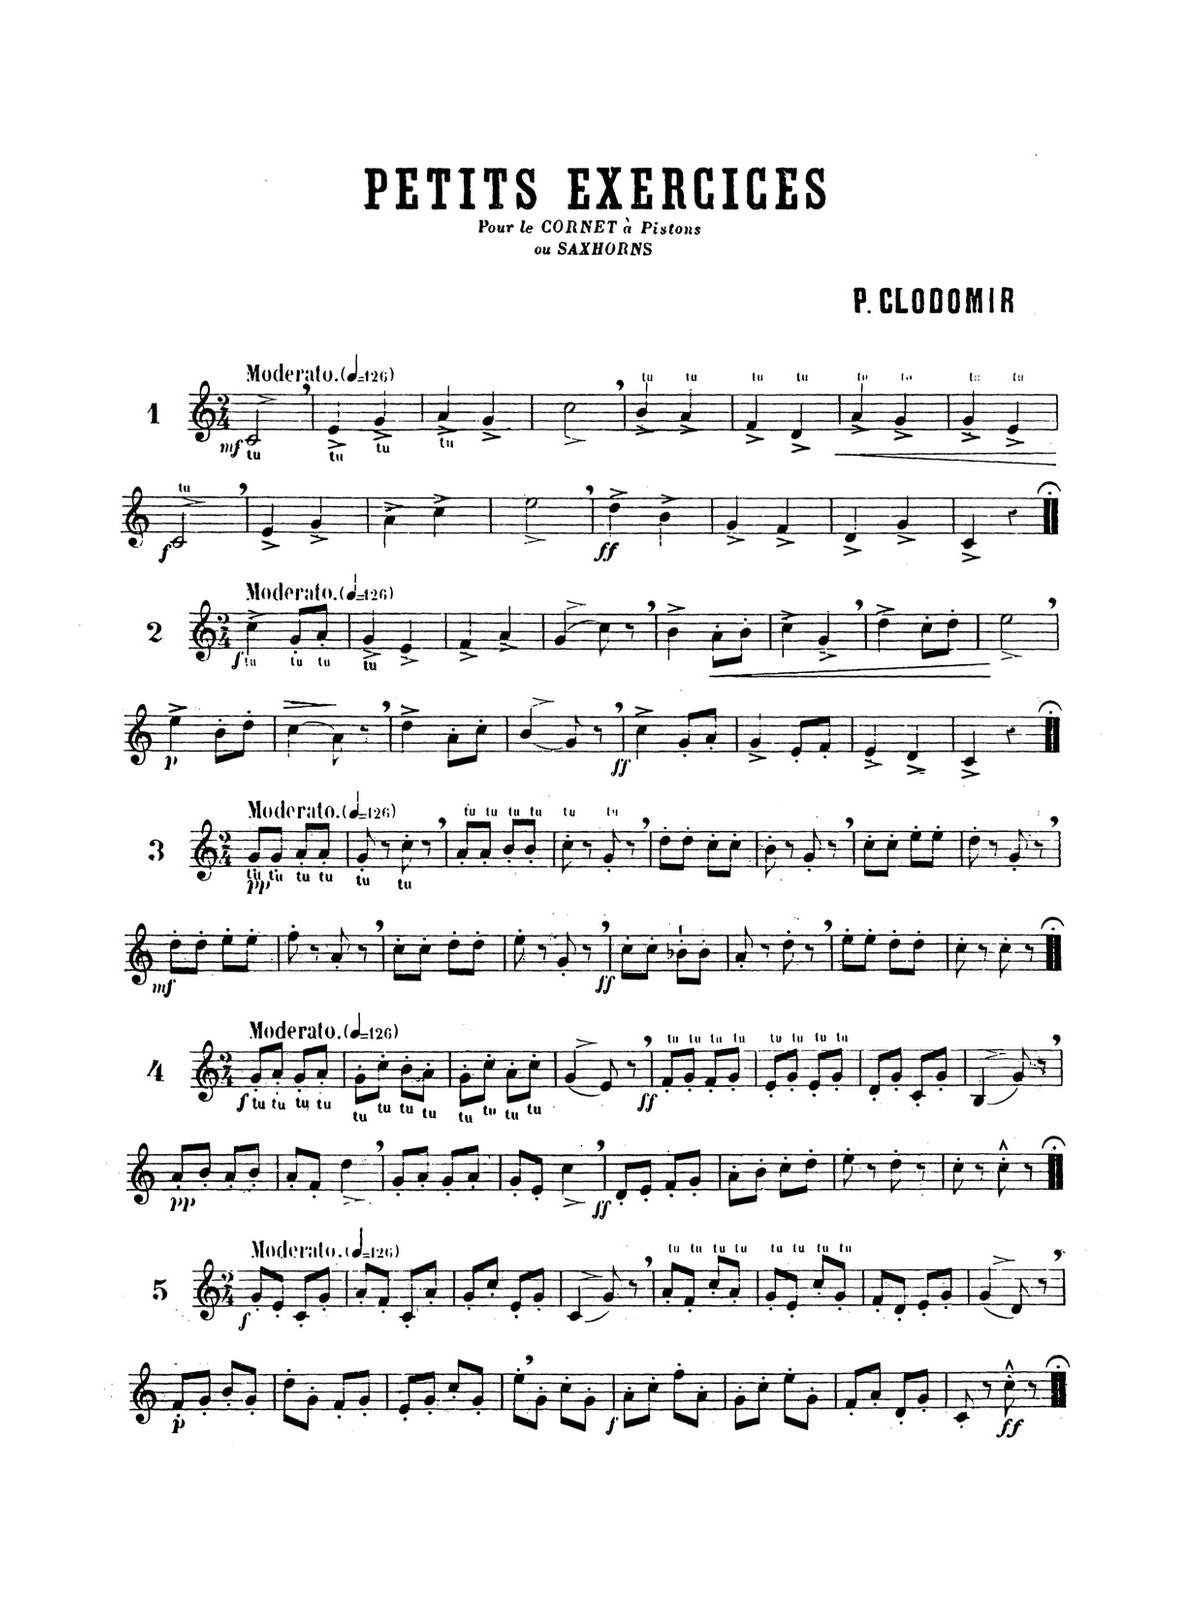 Clodomir, Ecole Moderne Vol.1 Petite Exercices 2